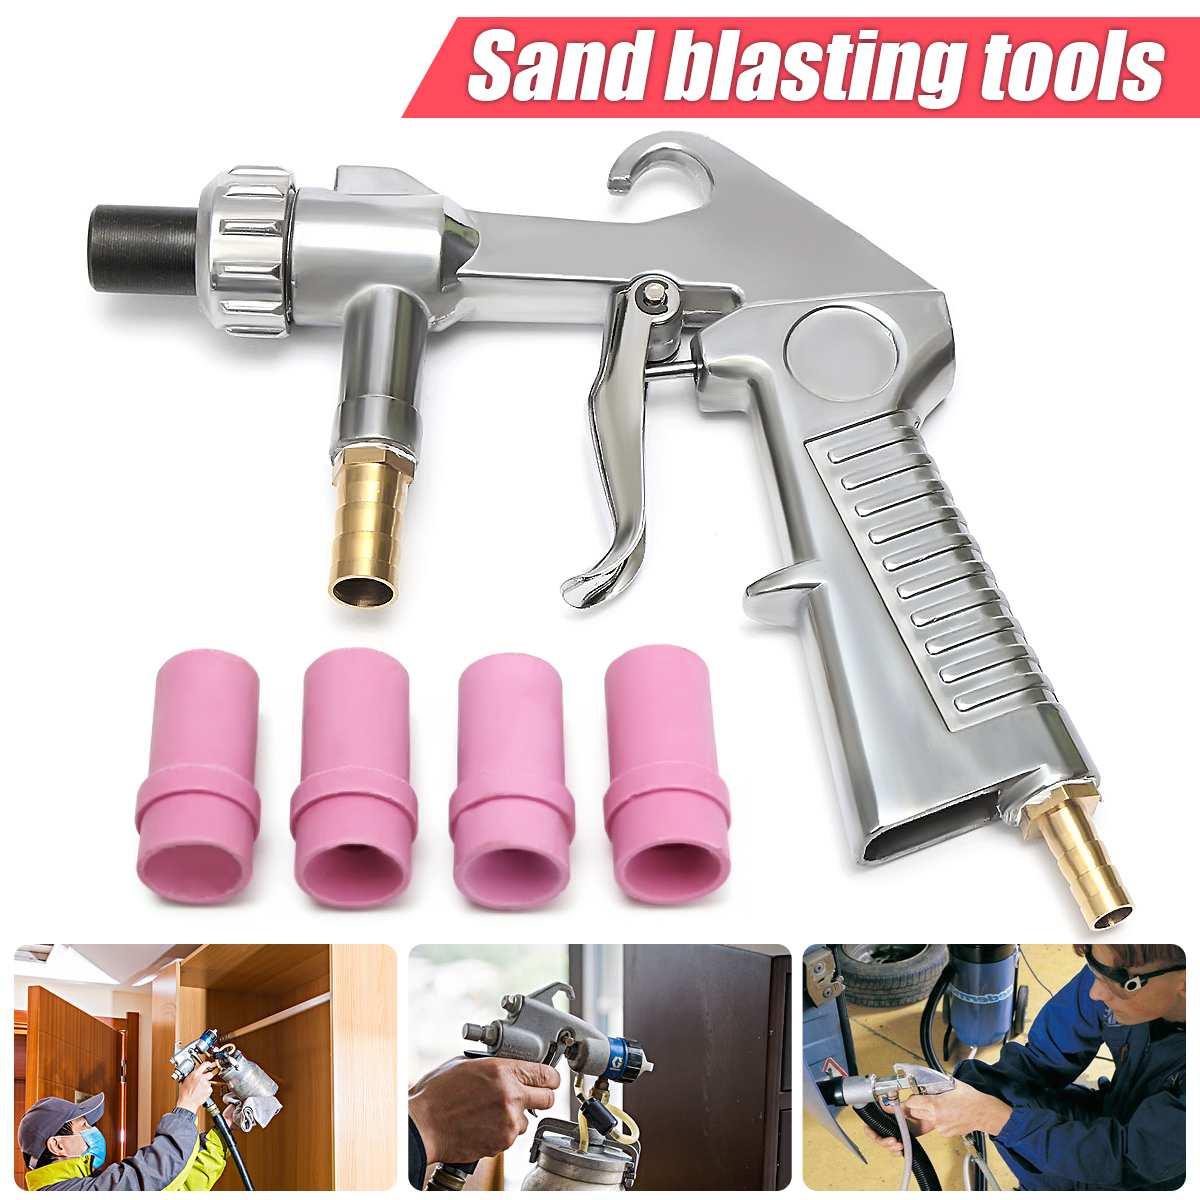 Sandblaster Guns Air Siphon W/4pcs( 4mm/5mm/6mm/7mm ) Ceramic Nozzles Abrasive